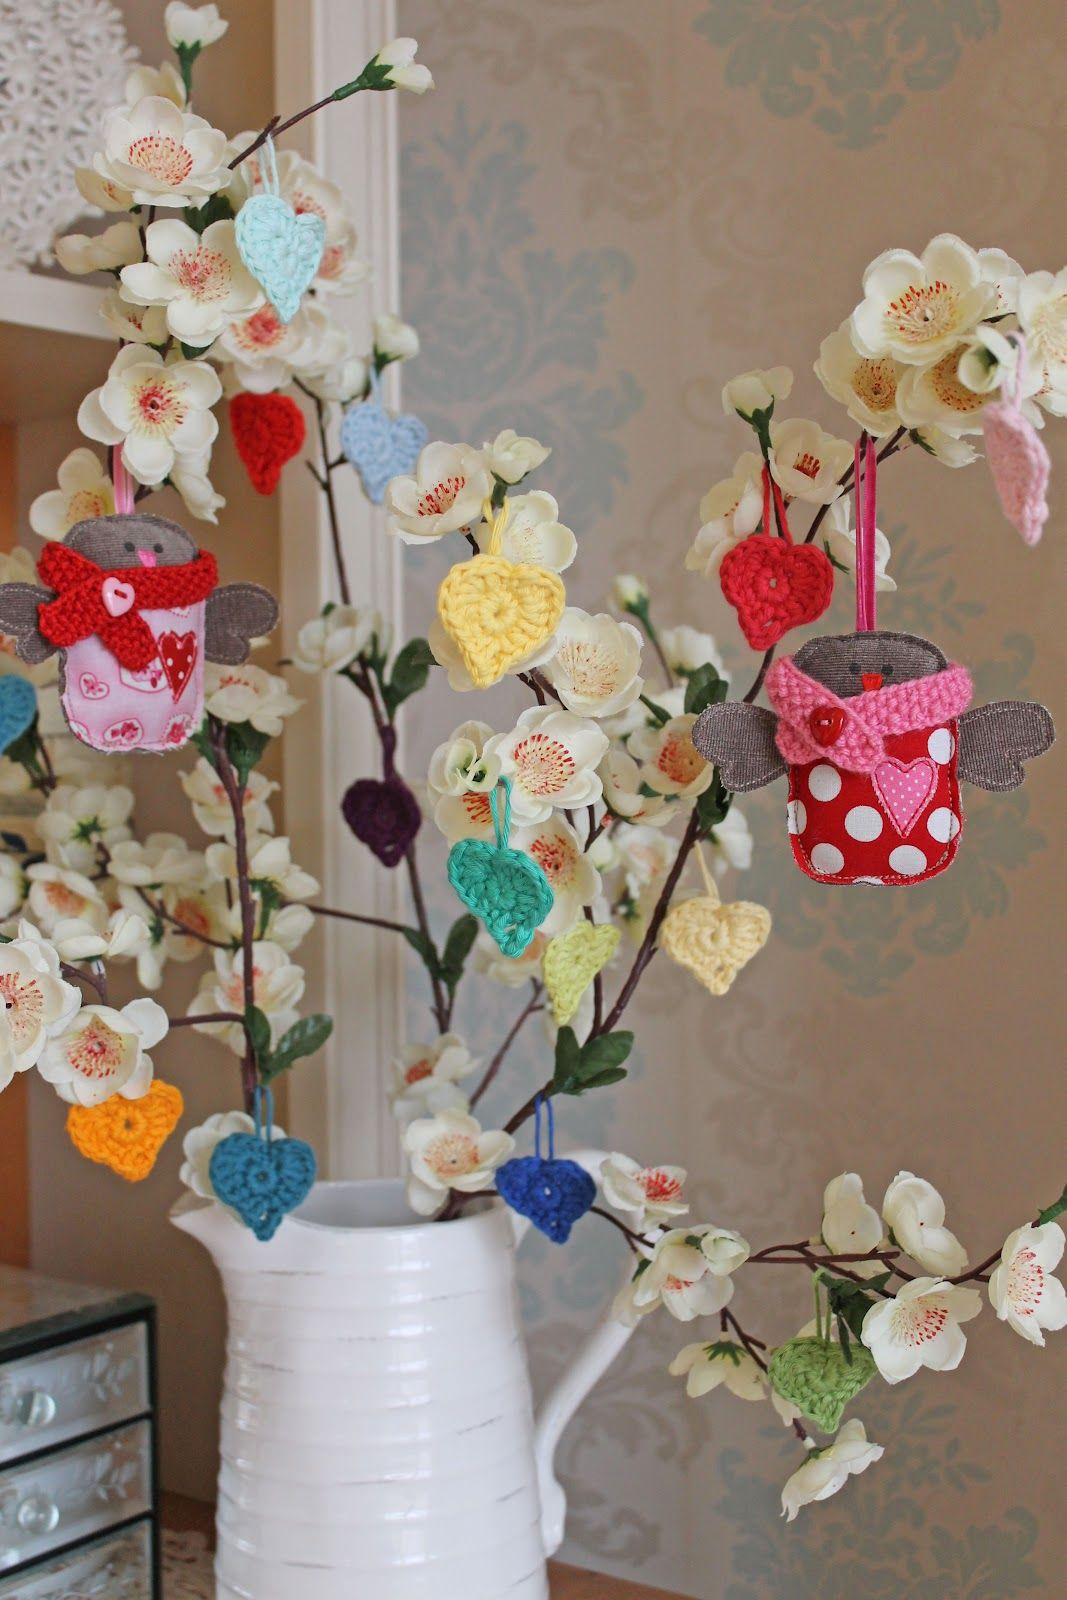 cupcakejojo: Hearts & Flowers Bunting Ta-da!!! ♥